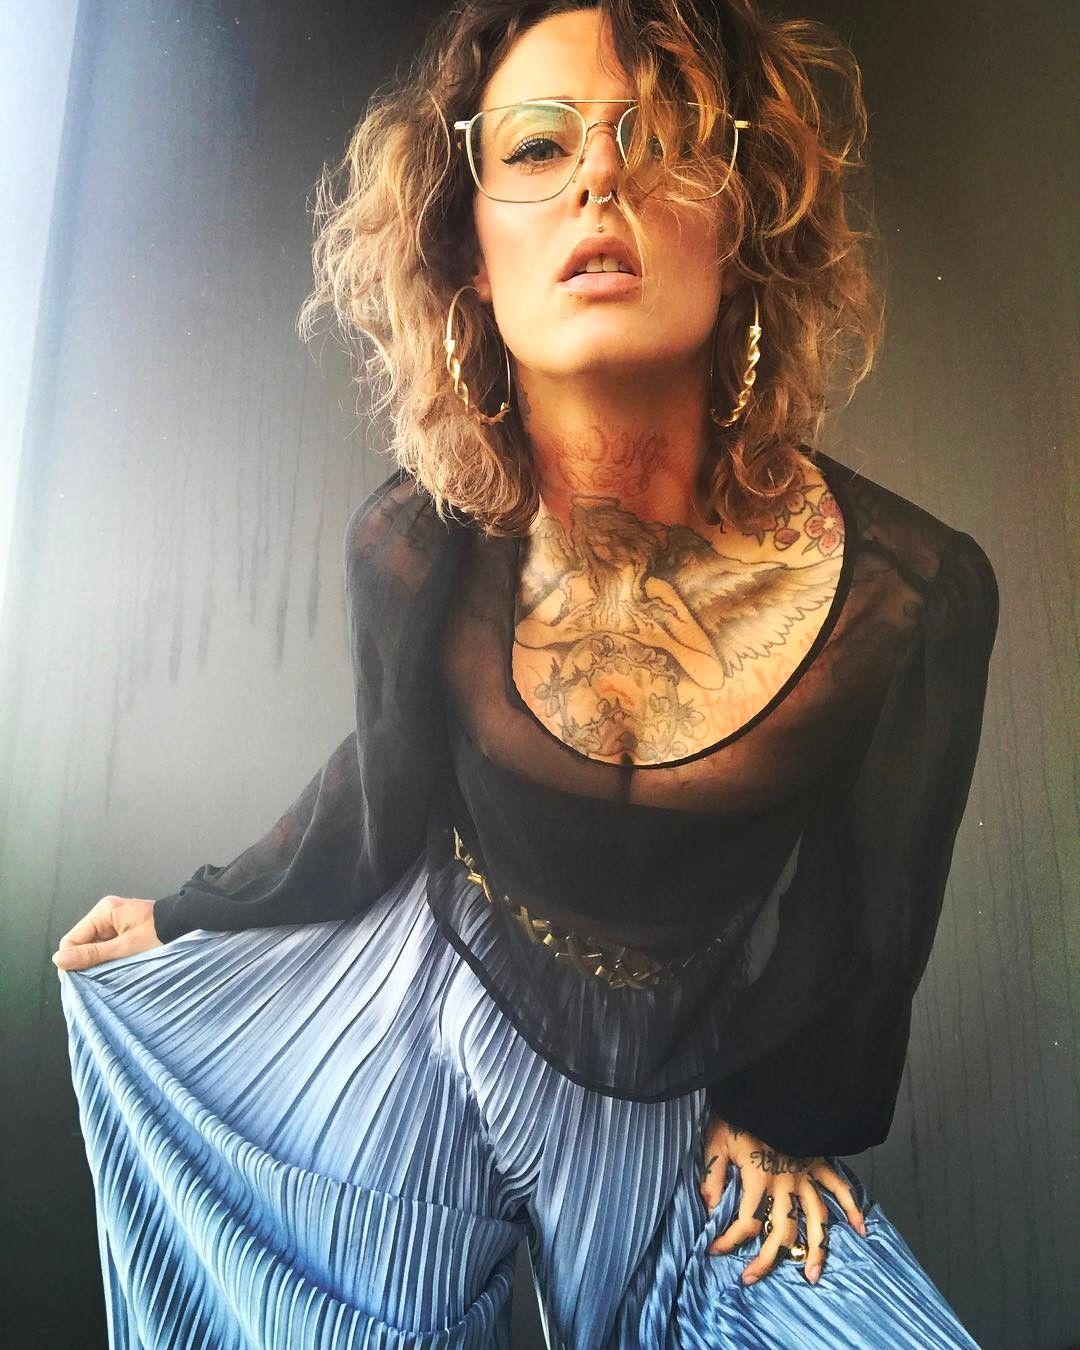 Cleavage Jennifer Weist nude photos 2019